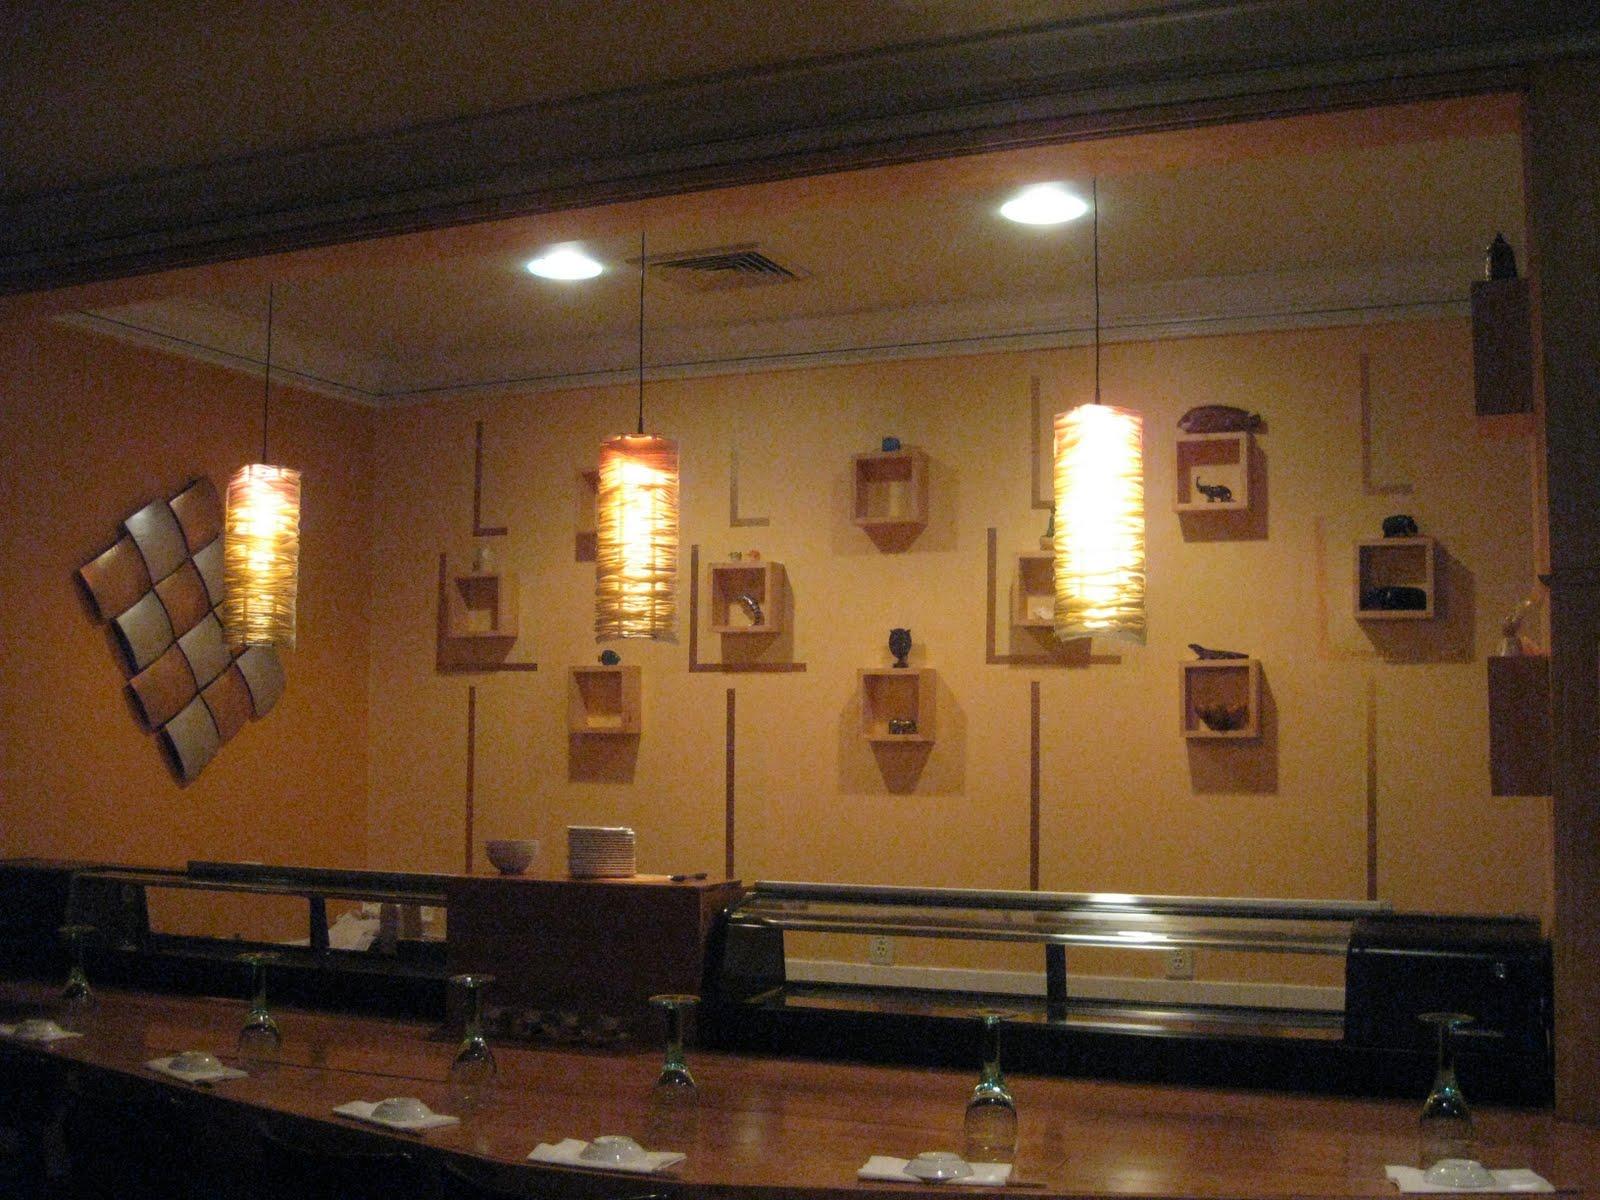 sushiandpassion: New Sushi Bar Wall Design